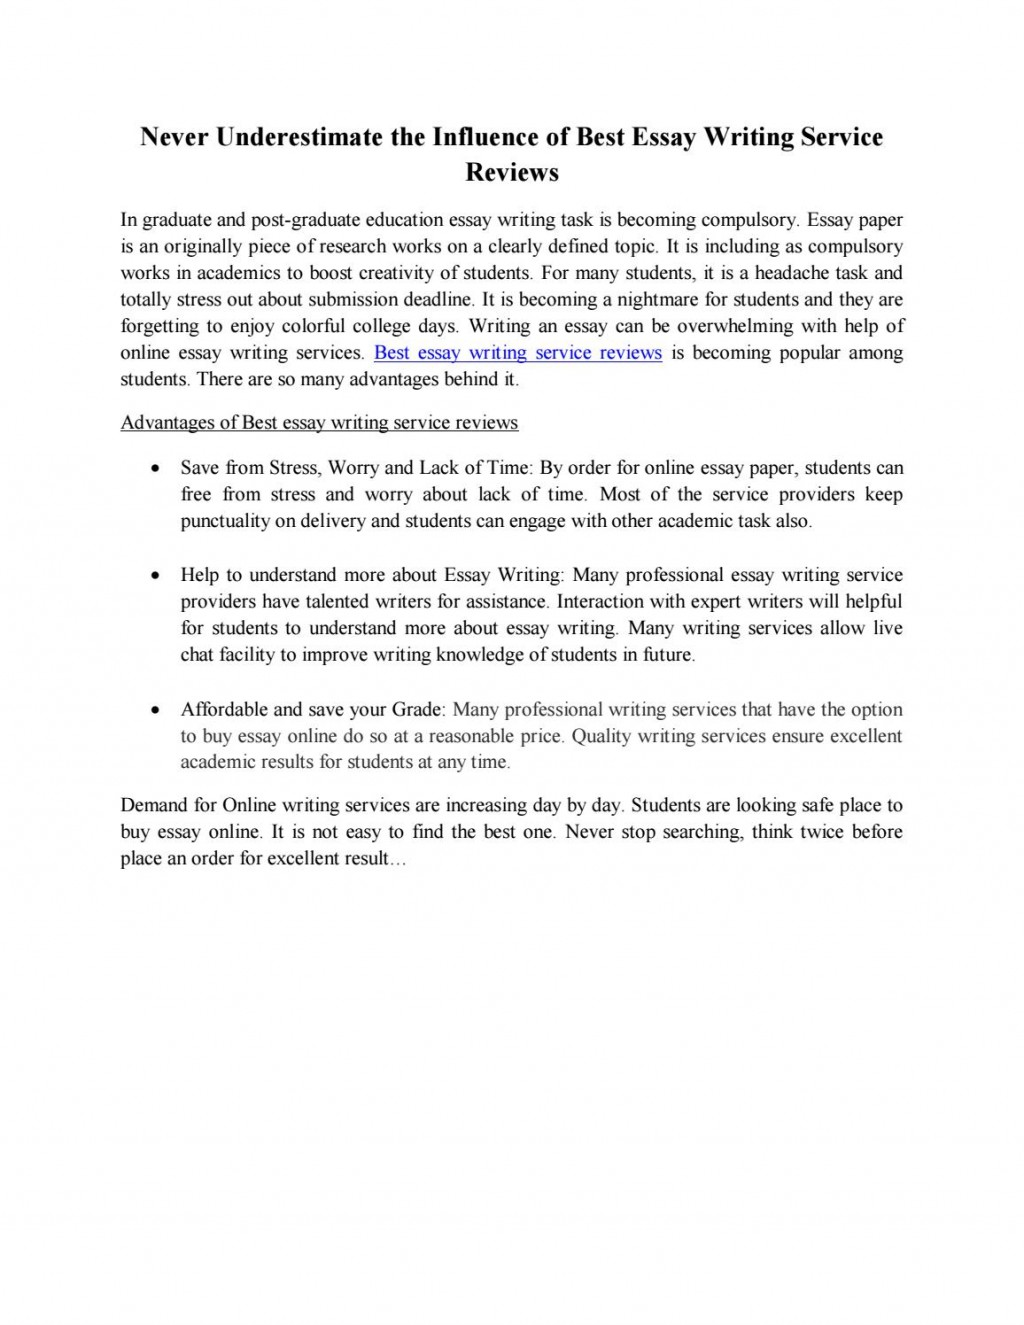 015 Top Essay Writing Reviews Page 1 Unique Large